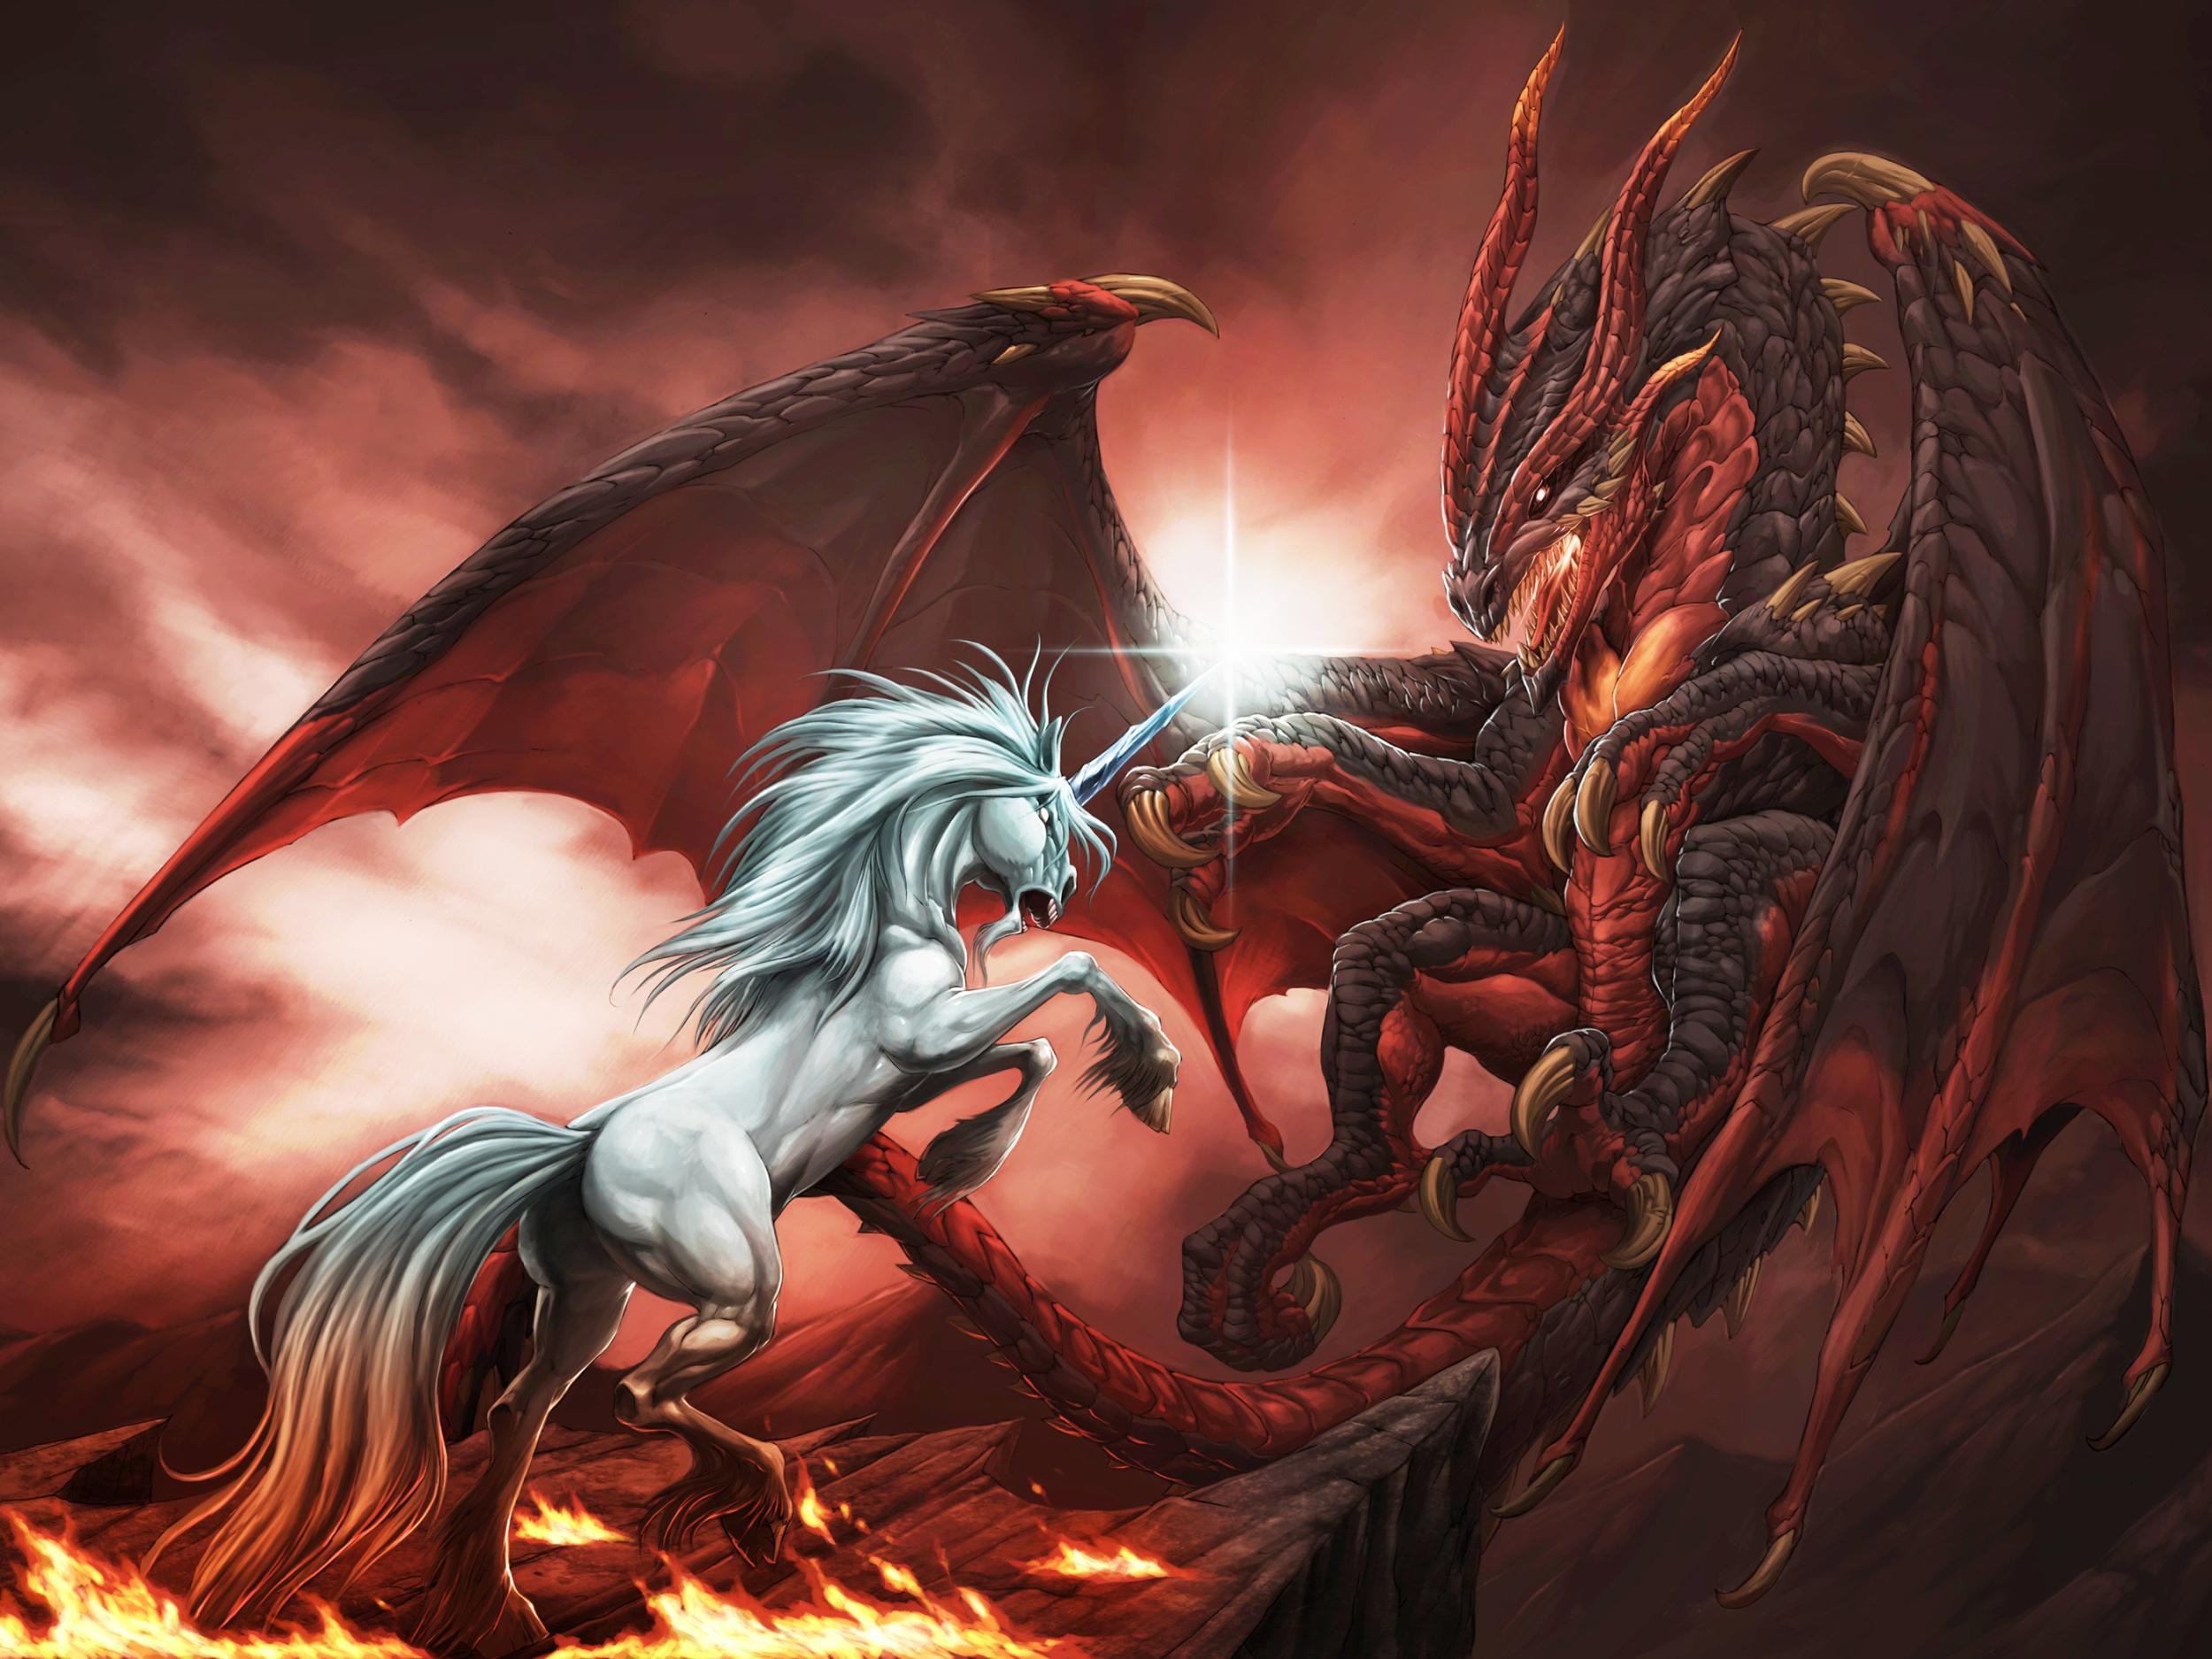 hd wallpaper dragon vs licorne 2500x1875